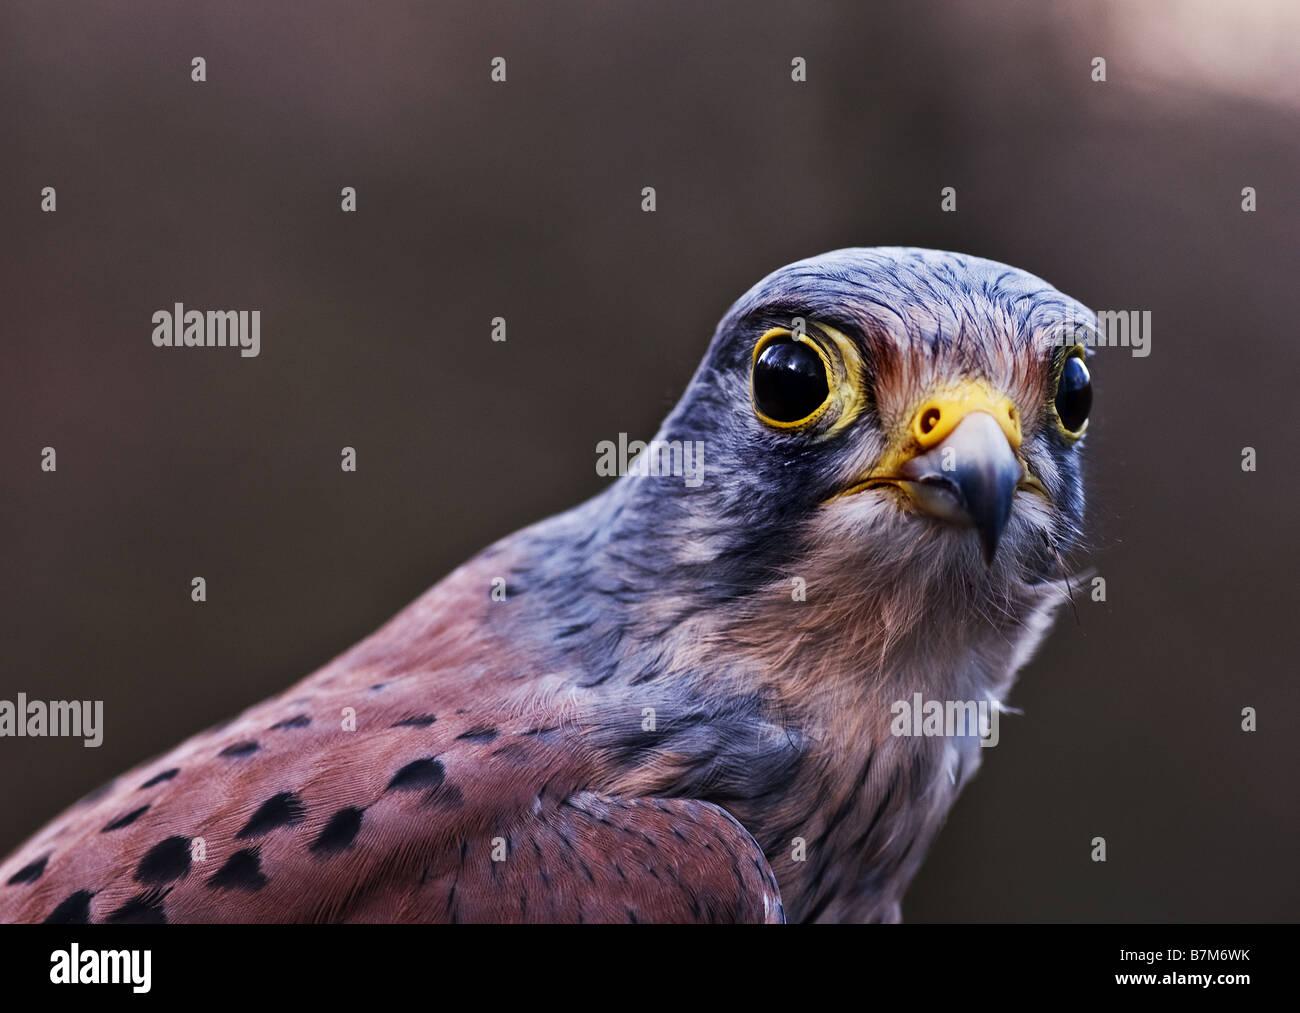 A male Kestrel. - Stock Image